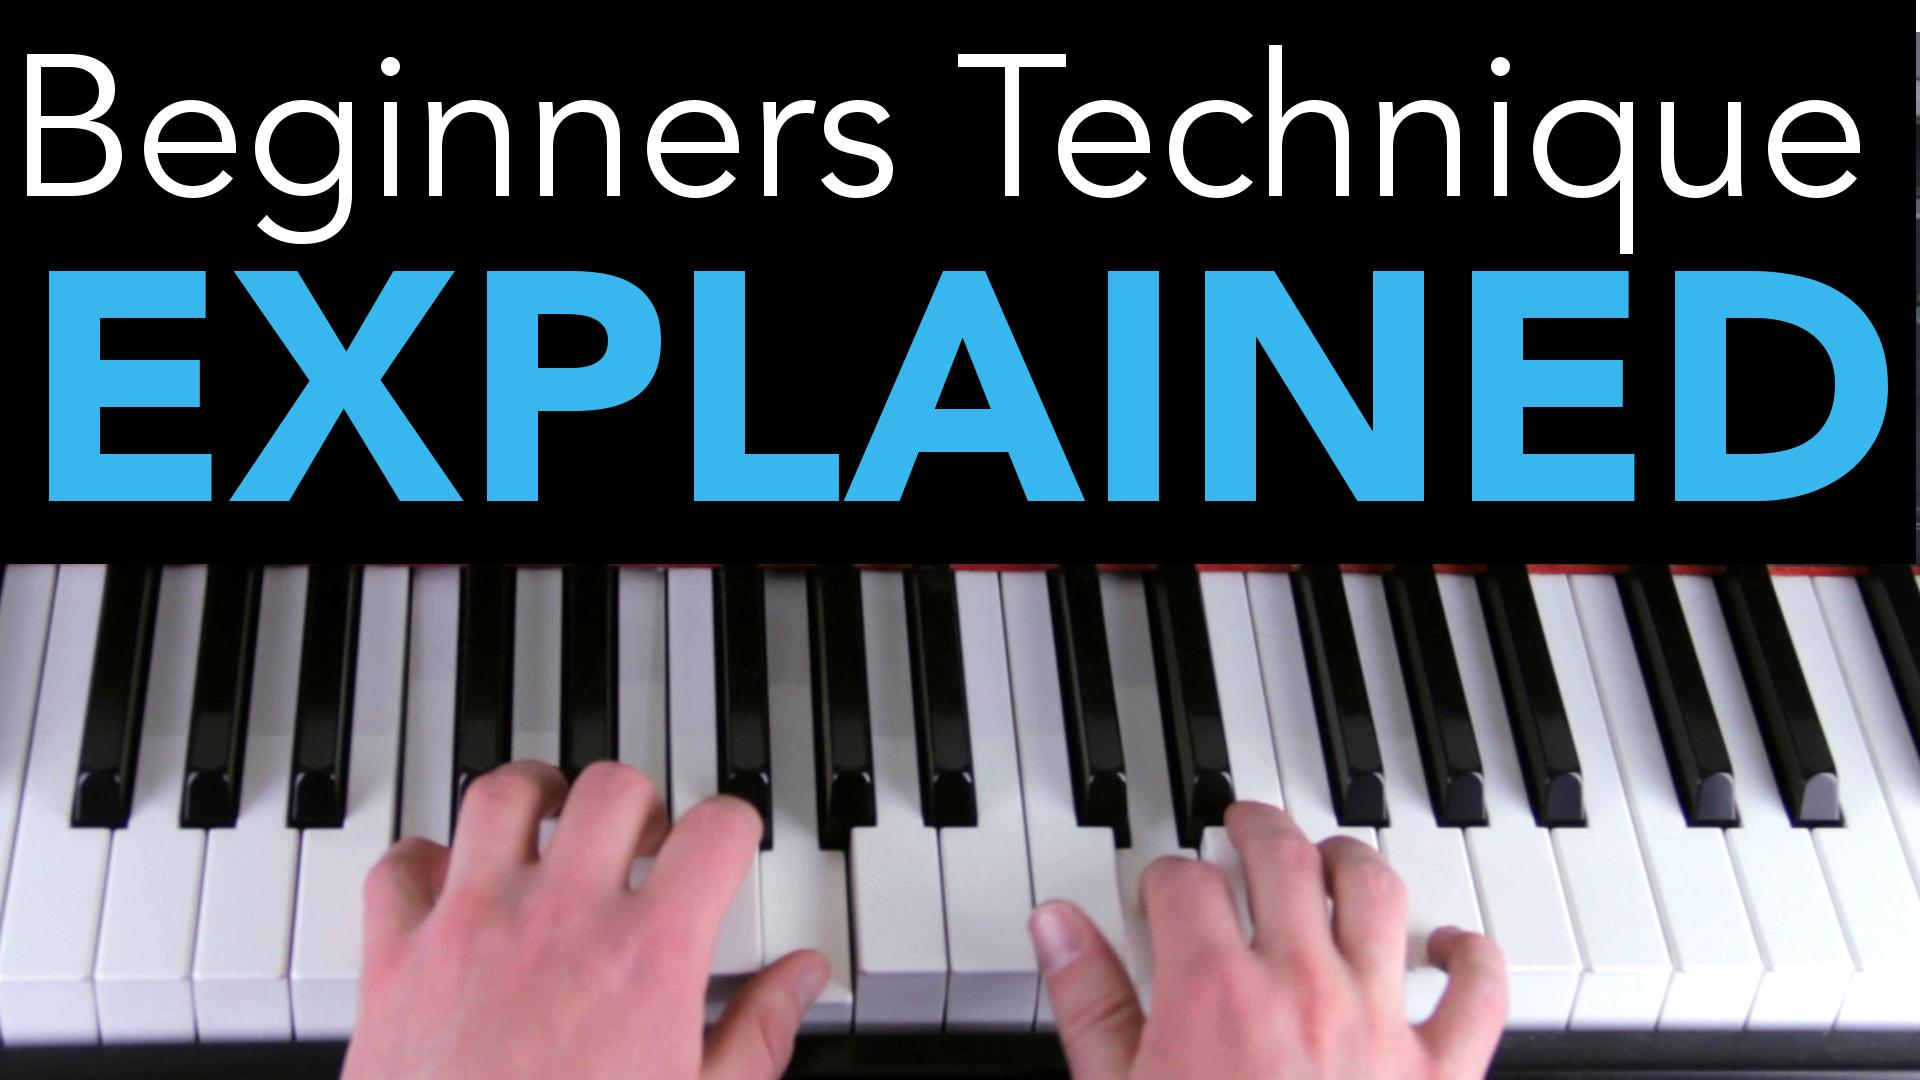 Bedwelming Beginners Piano Technique Explained #ZI65